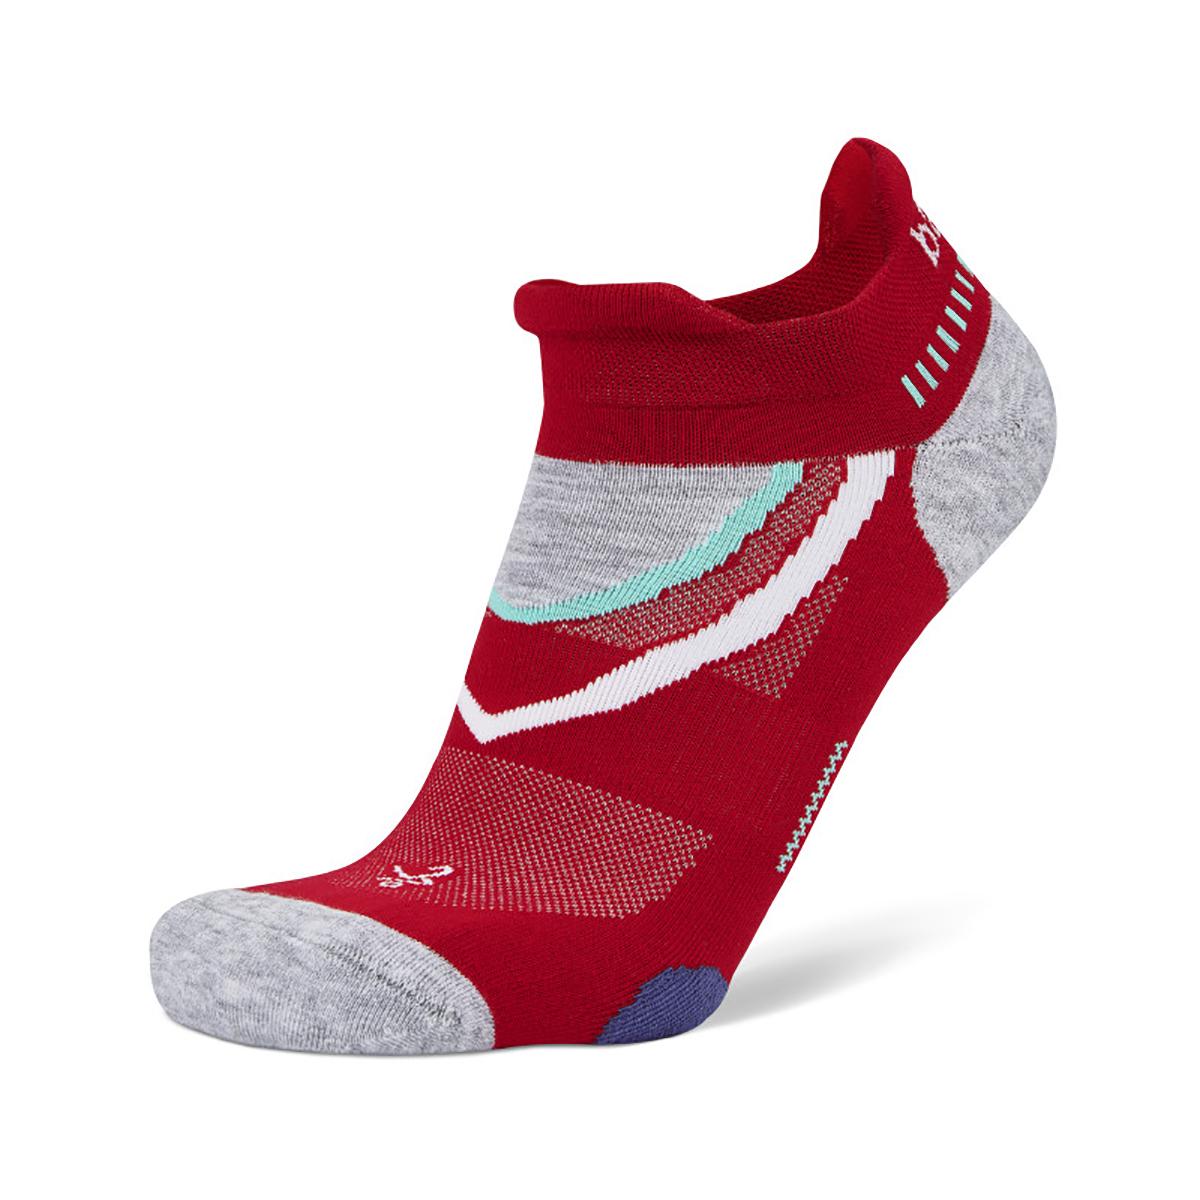 Balega UltraGlide Running Socks - Color: Bright Red/ Midgrey - Size: S, Bright Red/ Midgrey, large, image 1